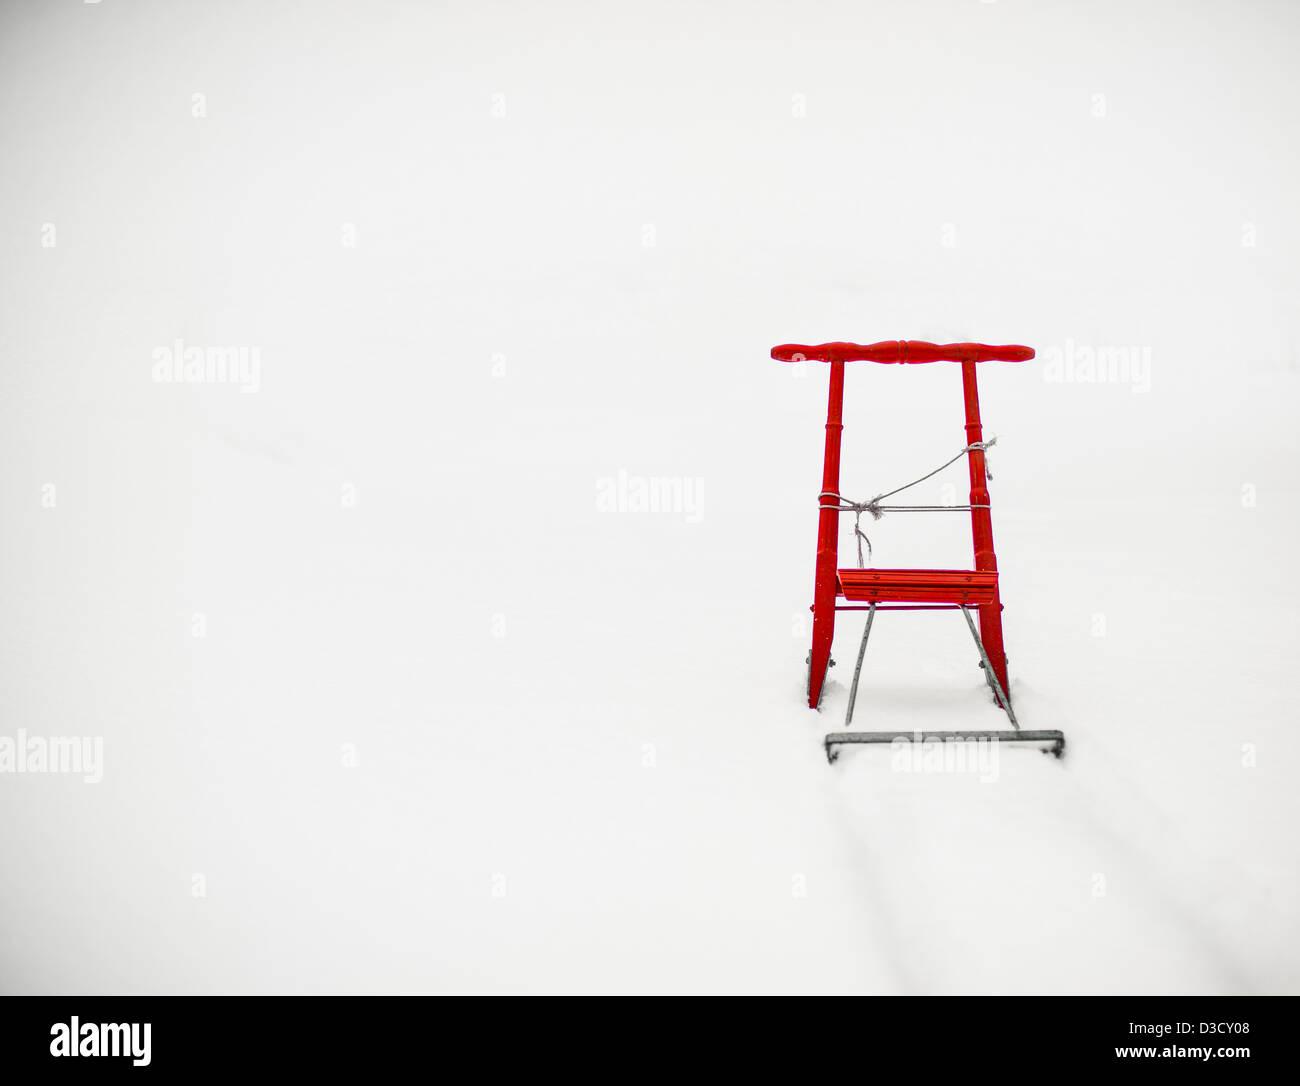 Orange children's sleigh in the snow - Stock Image